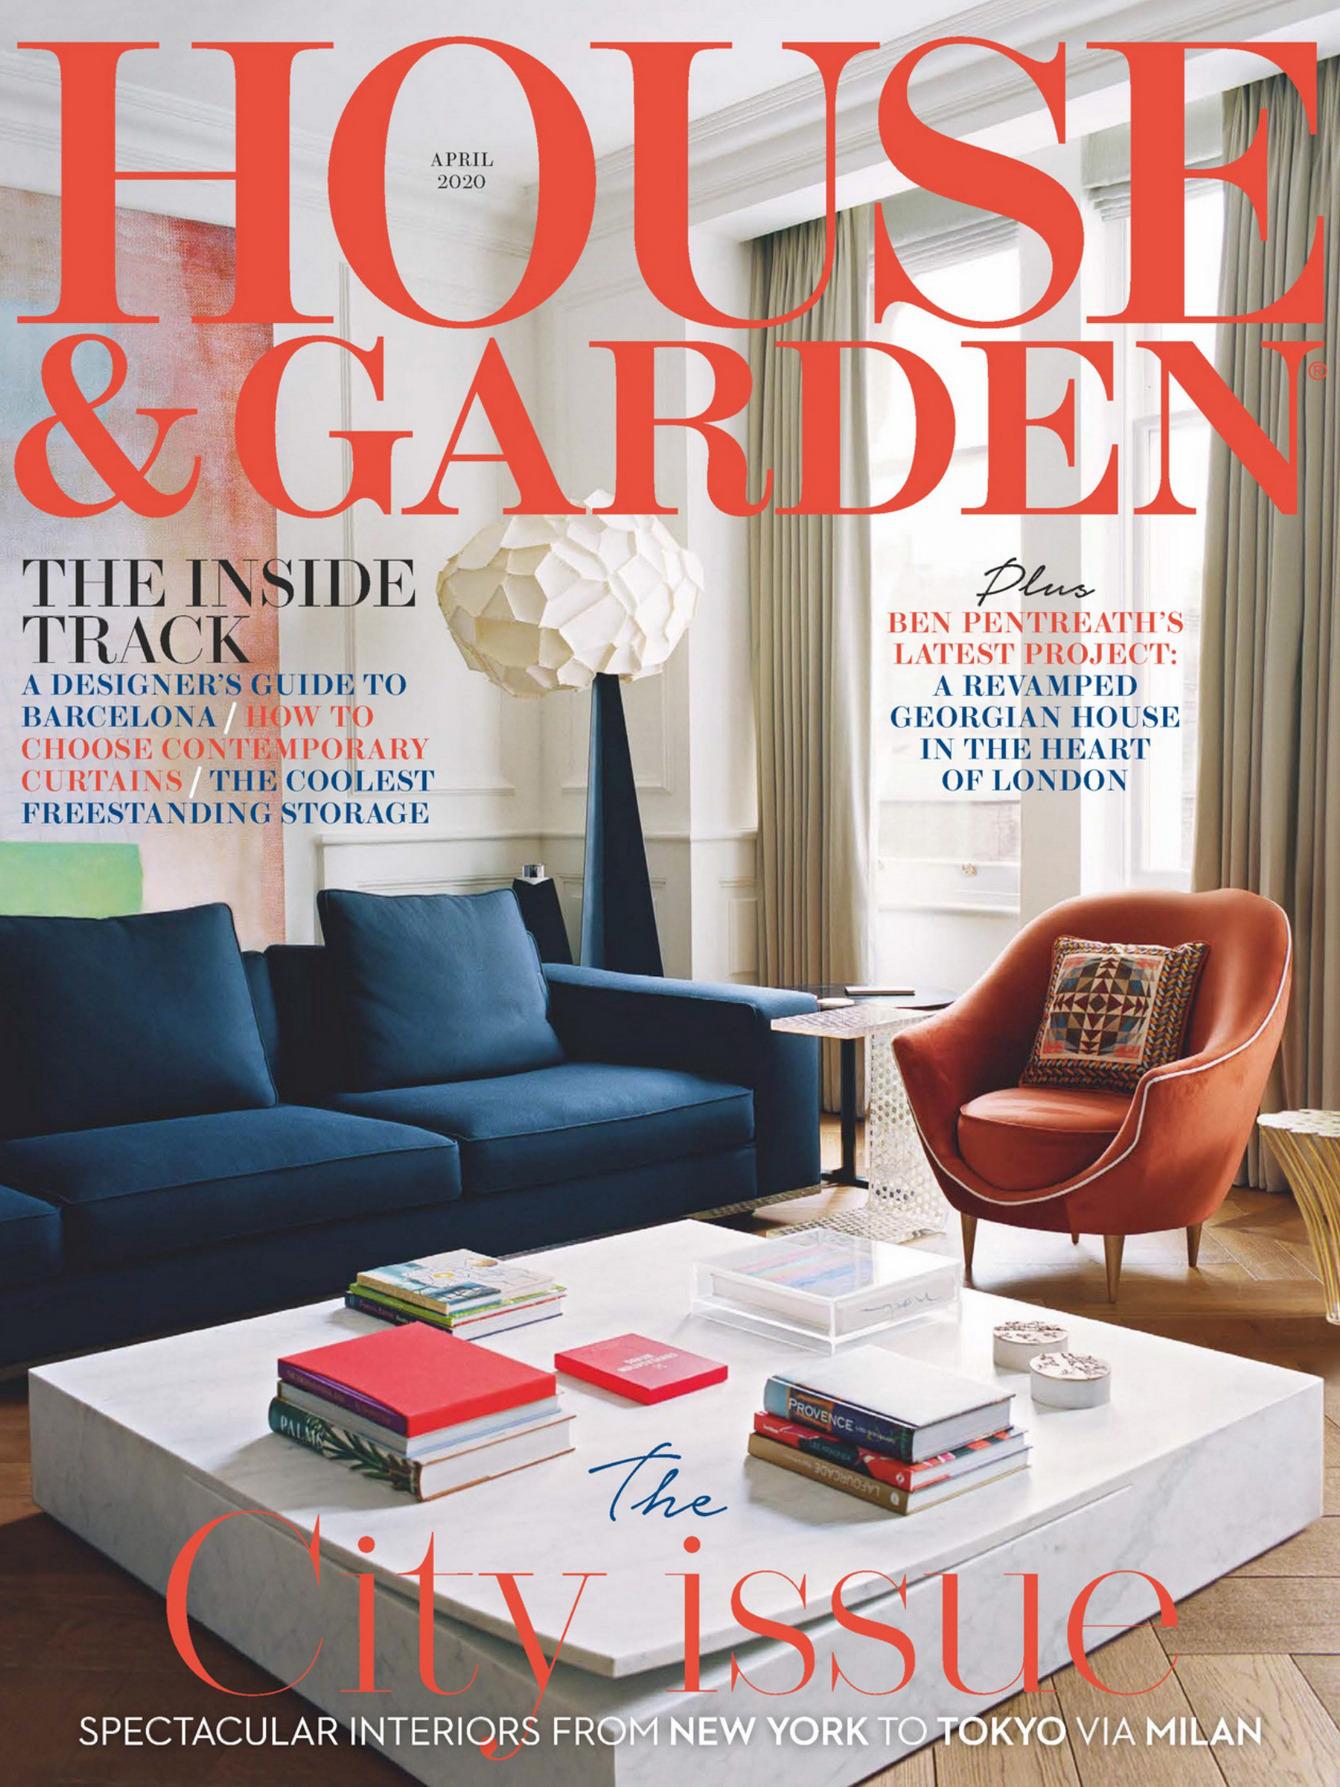 《House & Garden》英国版时尚家居杂志2020年04月号